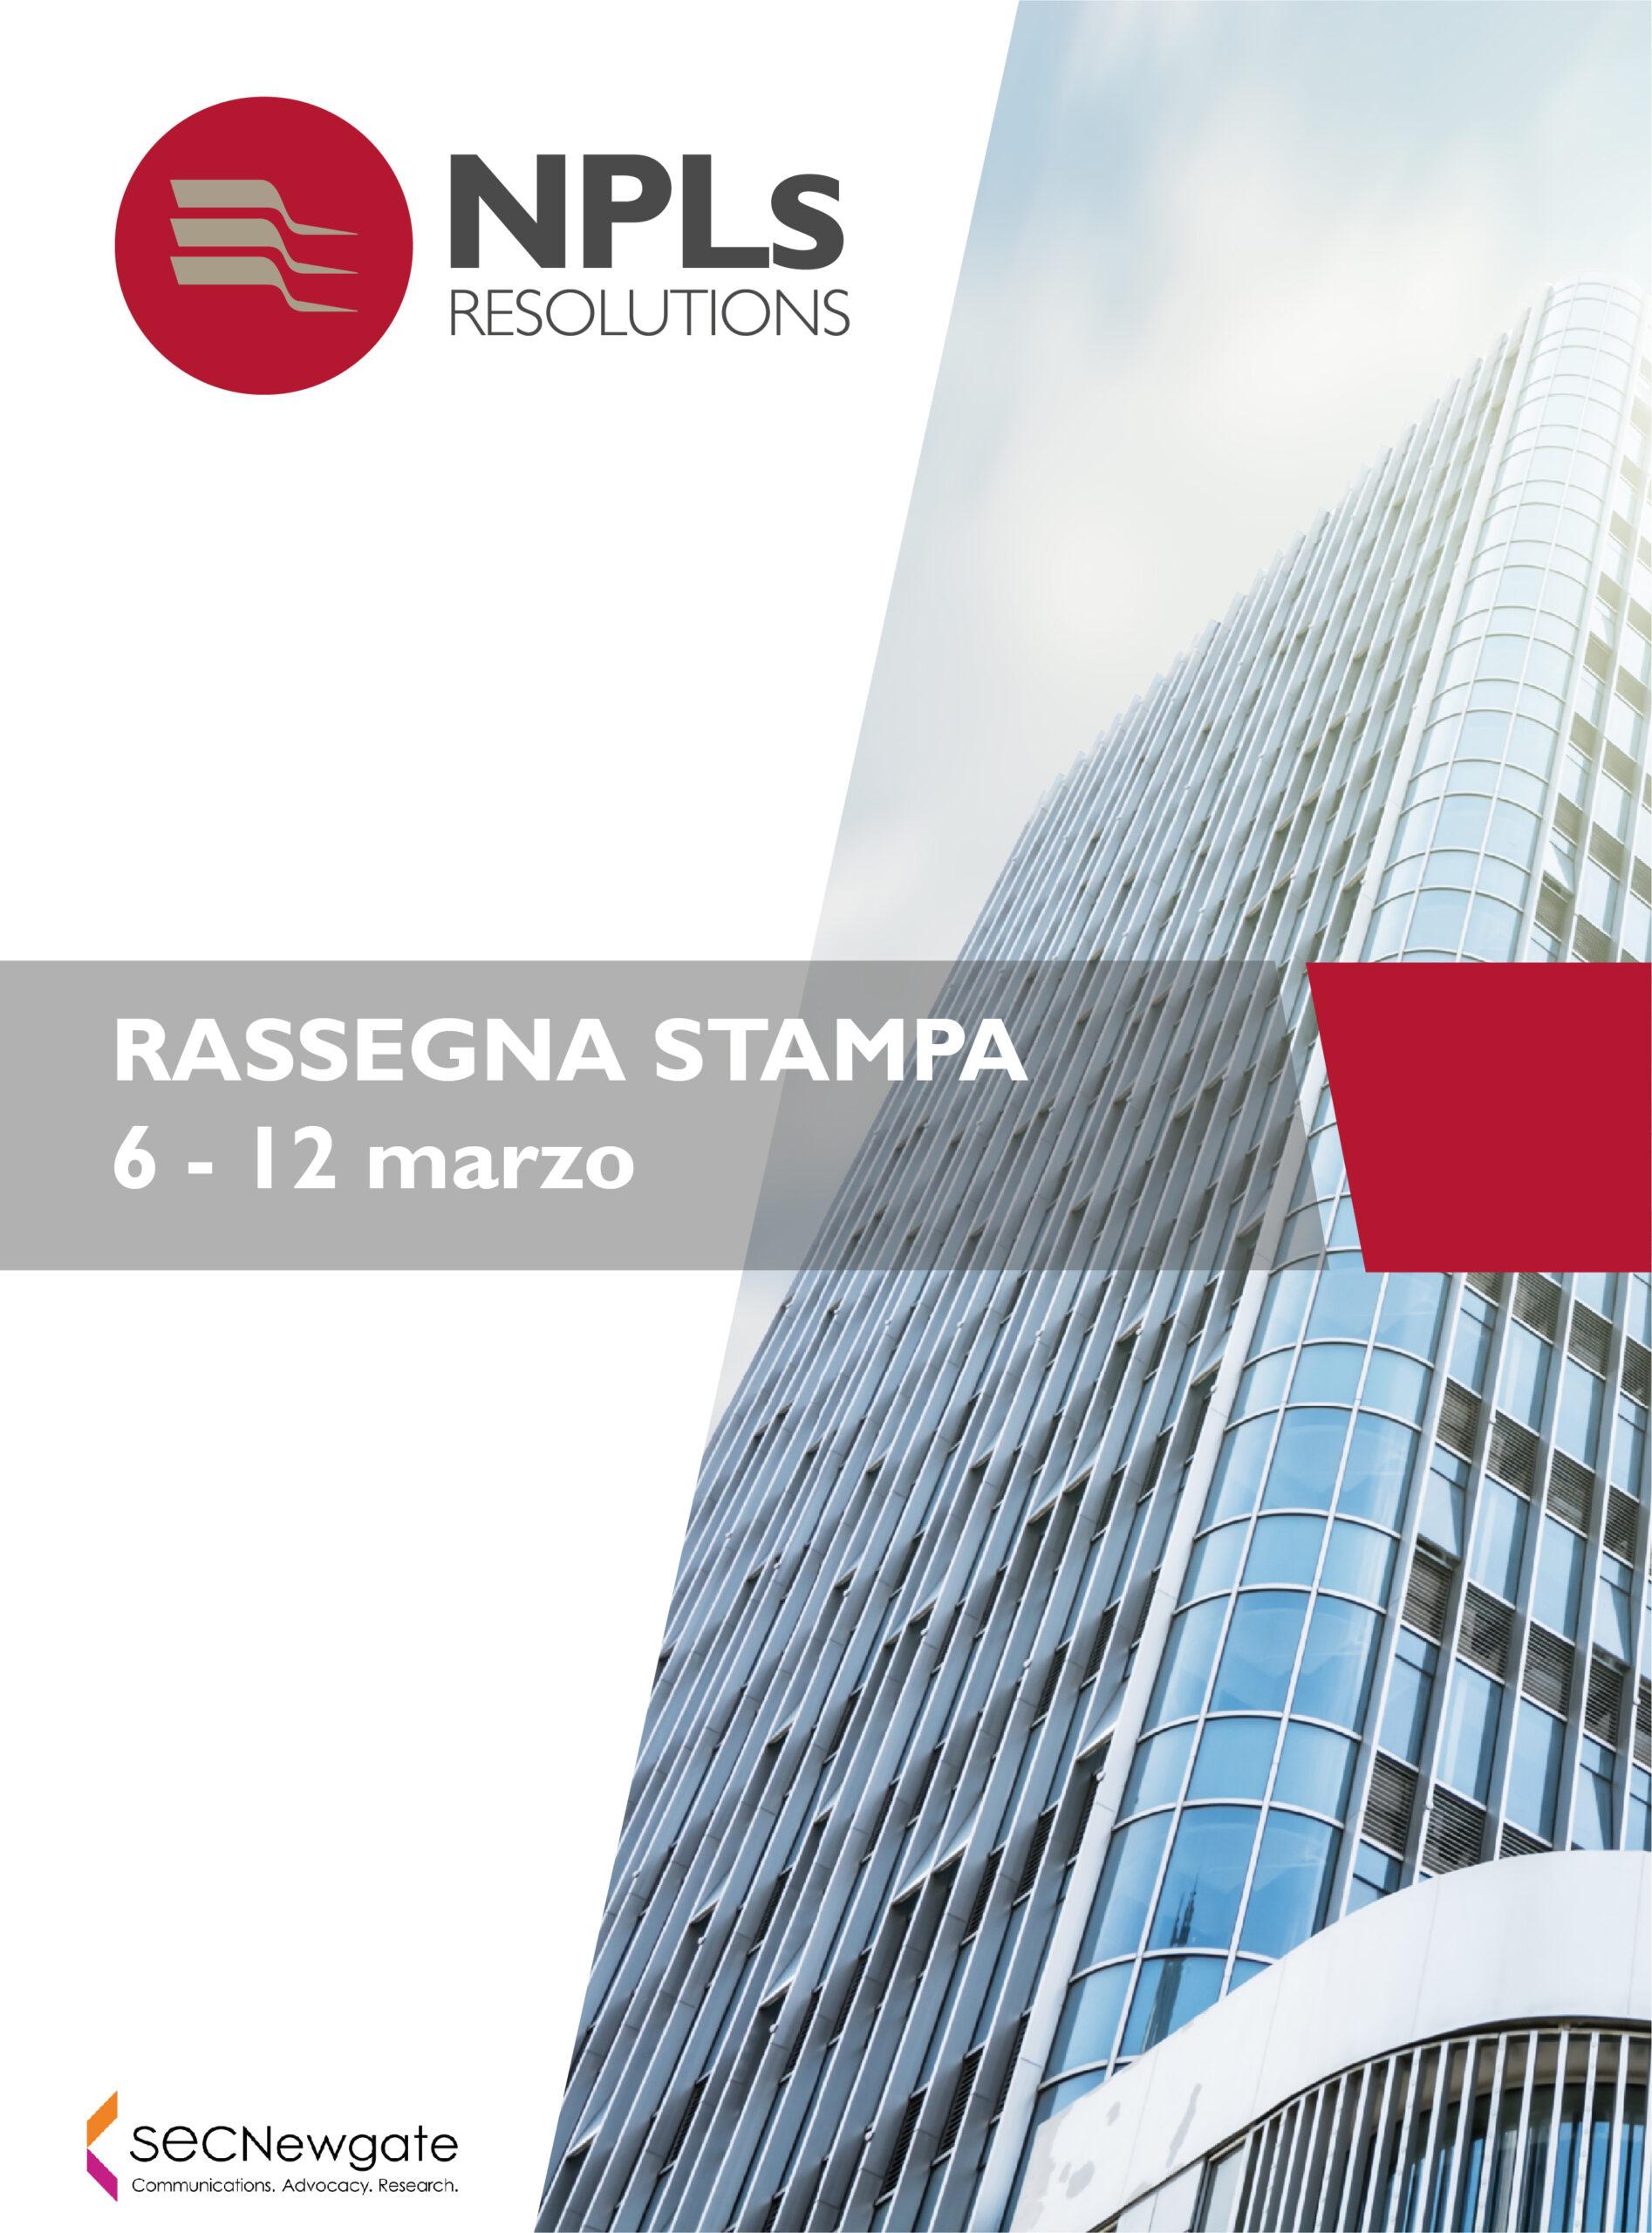 https://www.astasypoint.it/wp-content/uploads/2021/03/copertina-rassegna-stampa_6-12-03-scaled.jpg